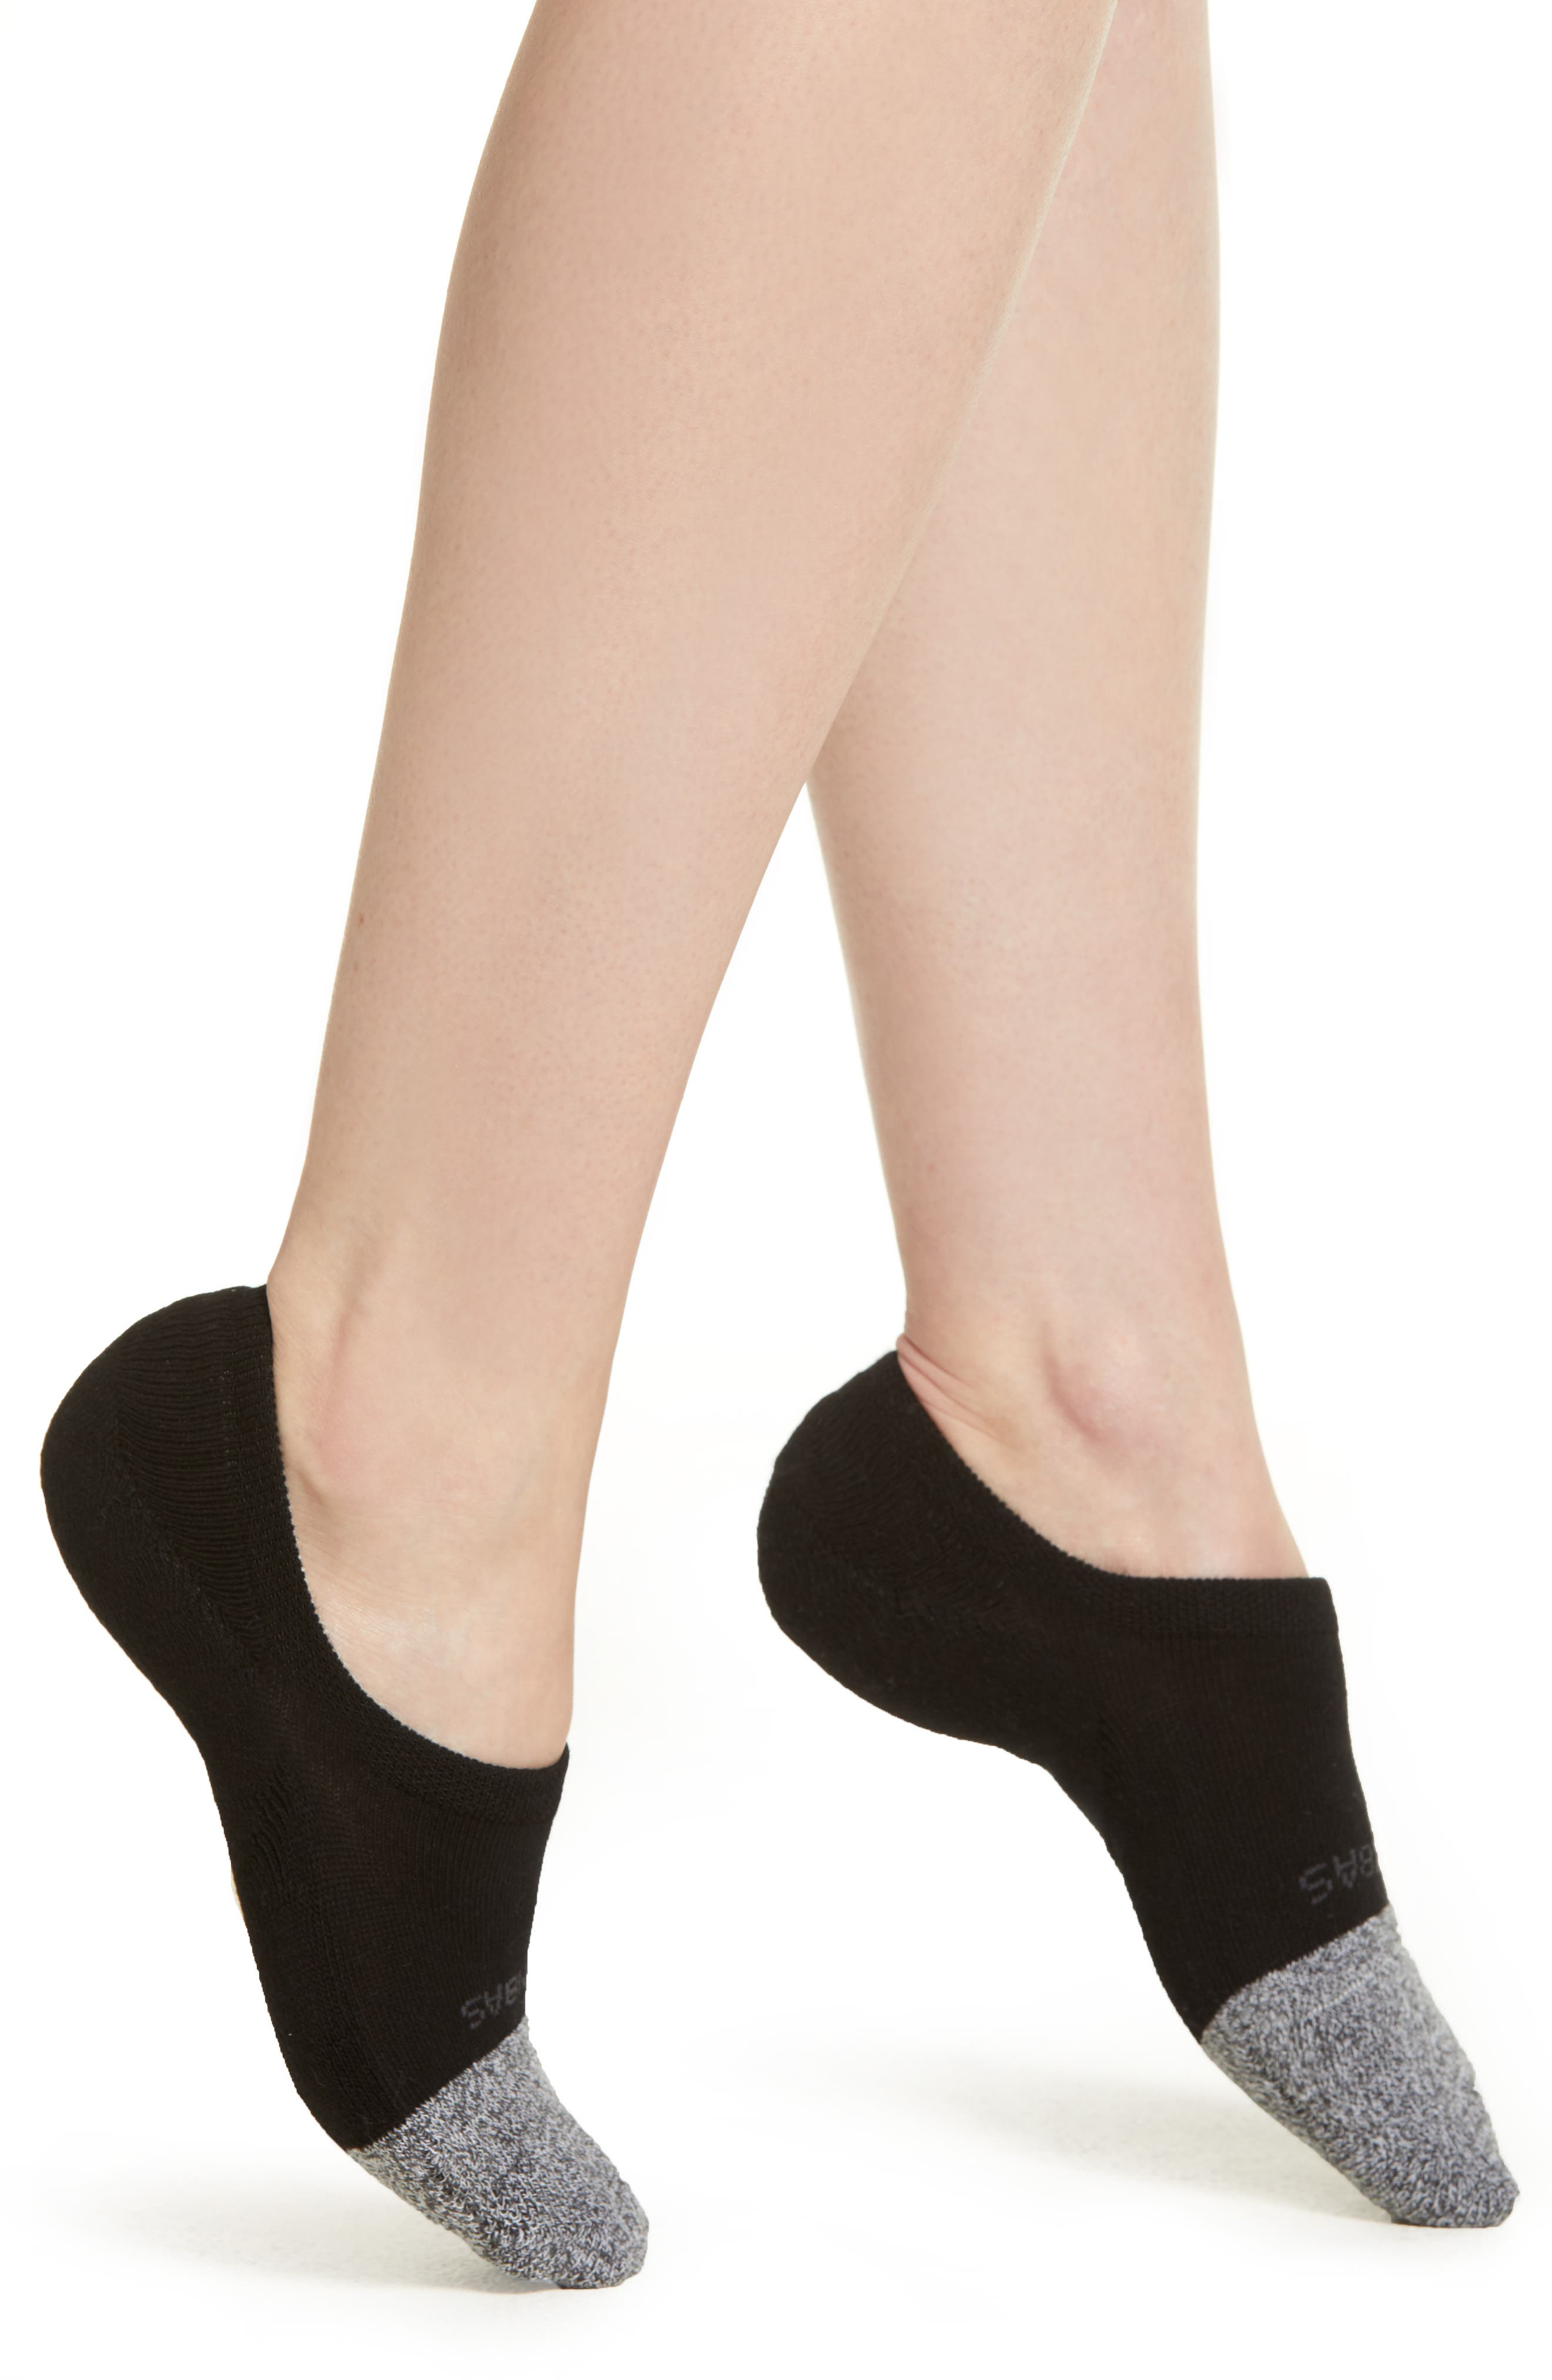 BOMBAS Cushioned No-Show Socks, Main, color, BLACK